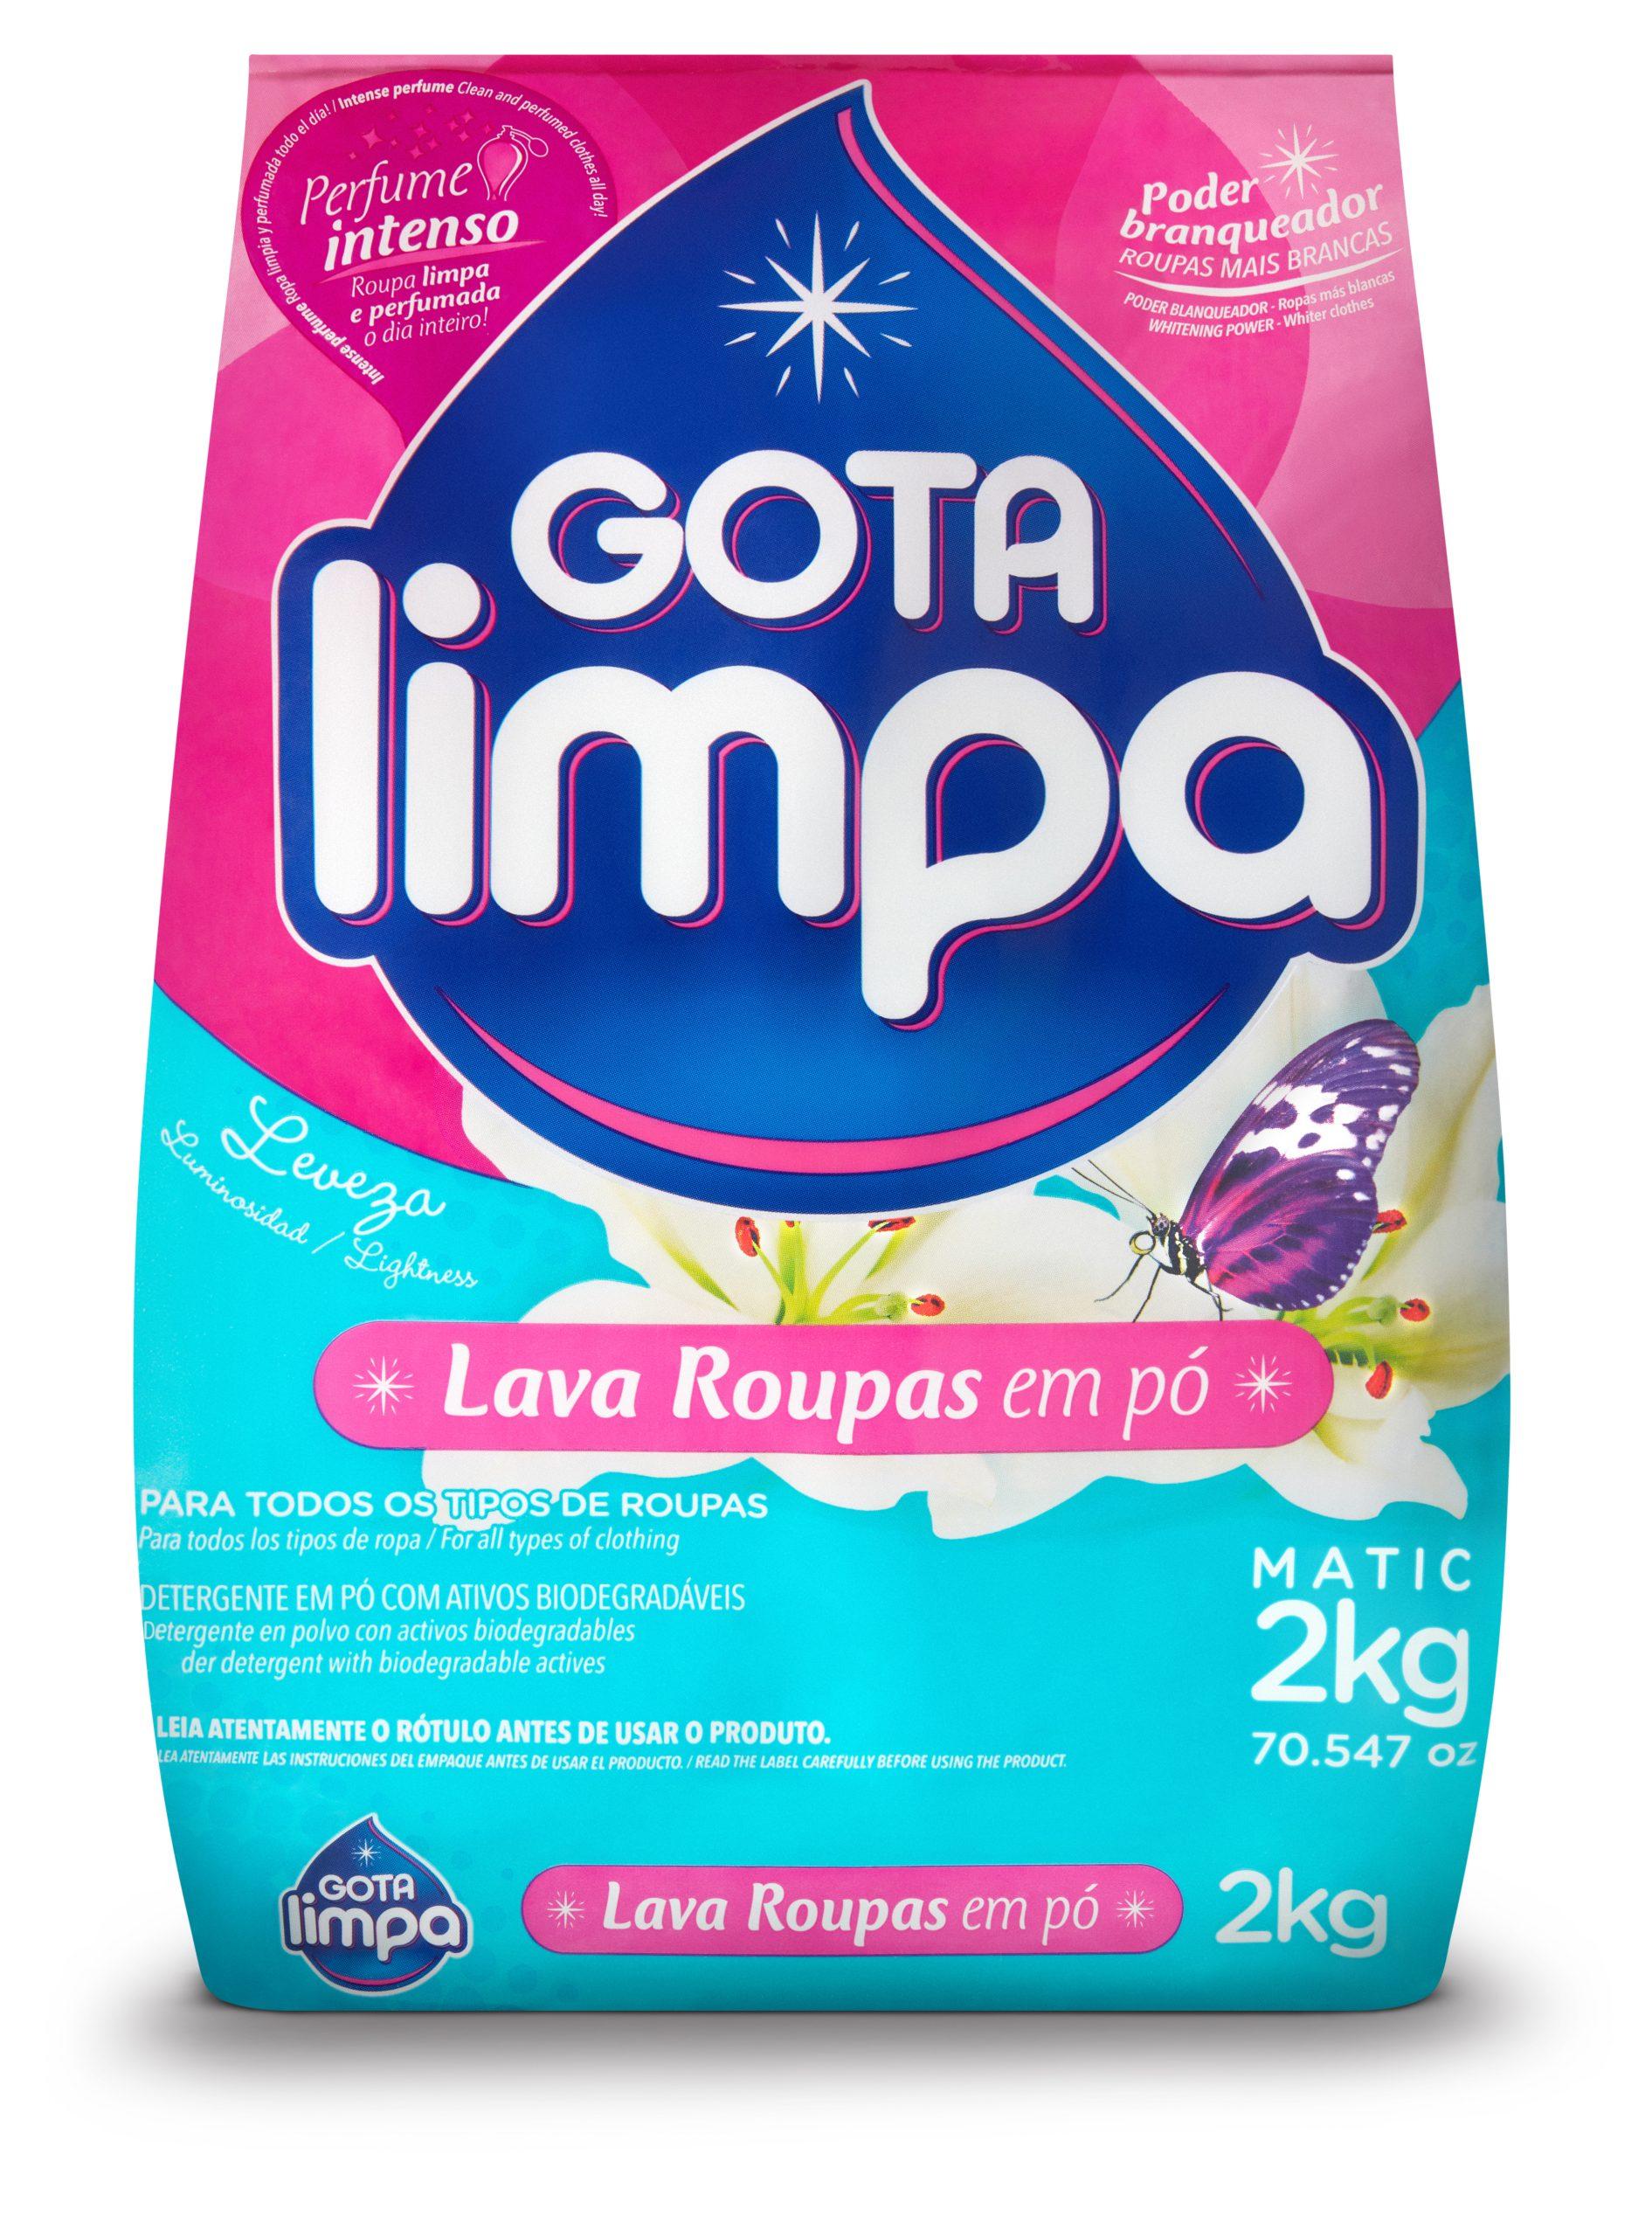 Gota Limpa Powder Laundry Detergent Lightness 2Kg